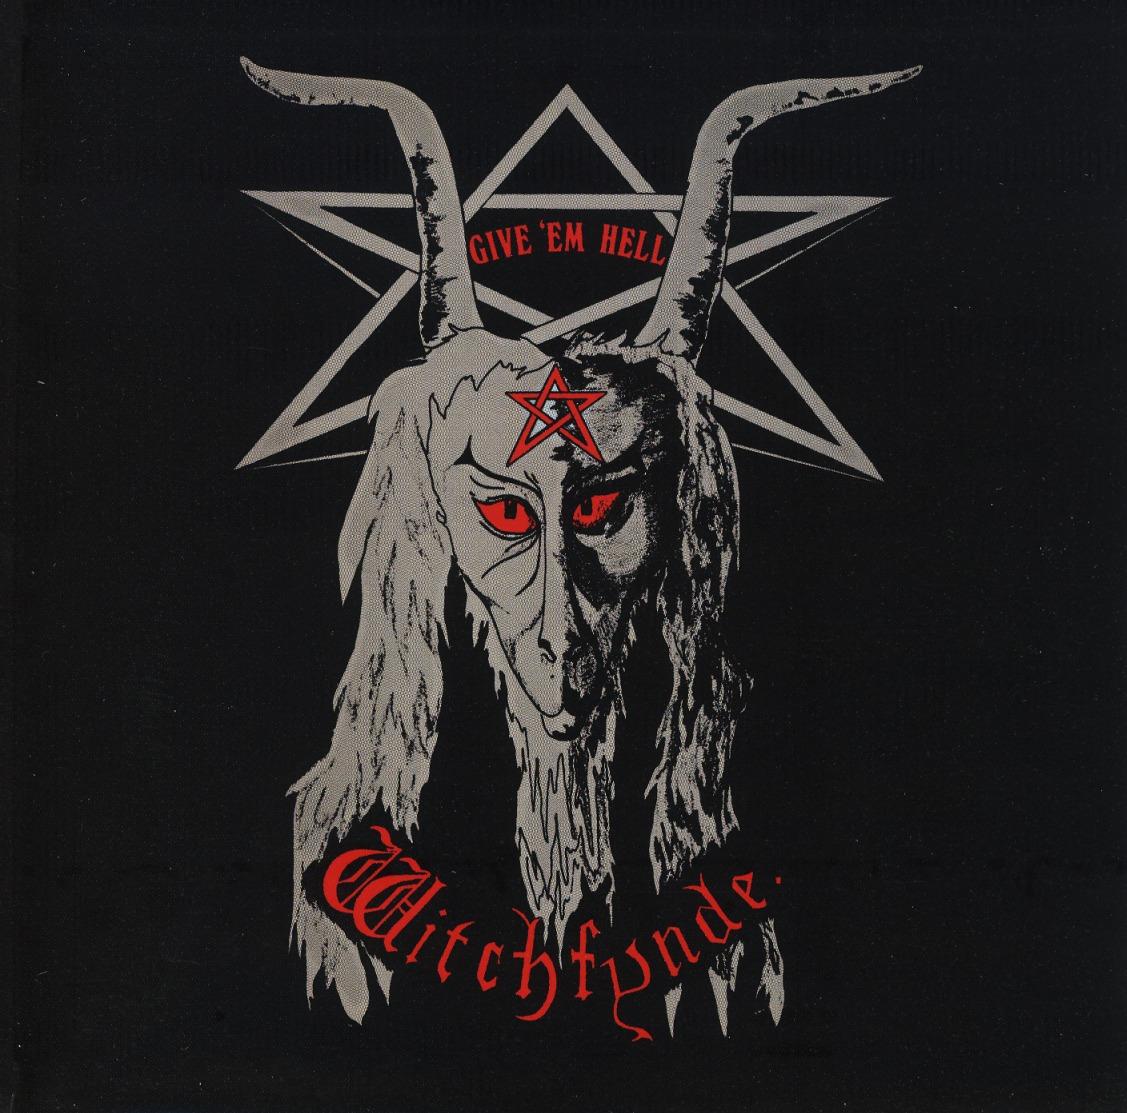 WITCHFYNDE (UK) / Give 'em Hell + 3